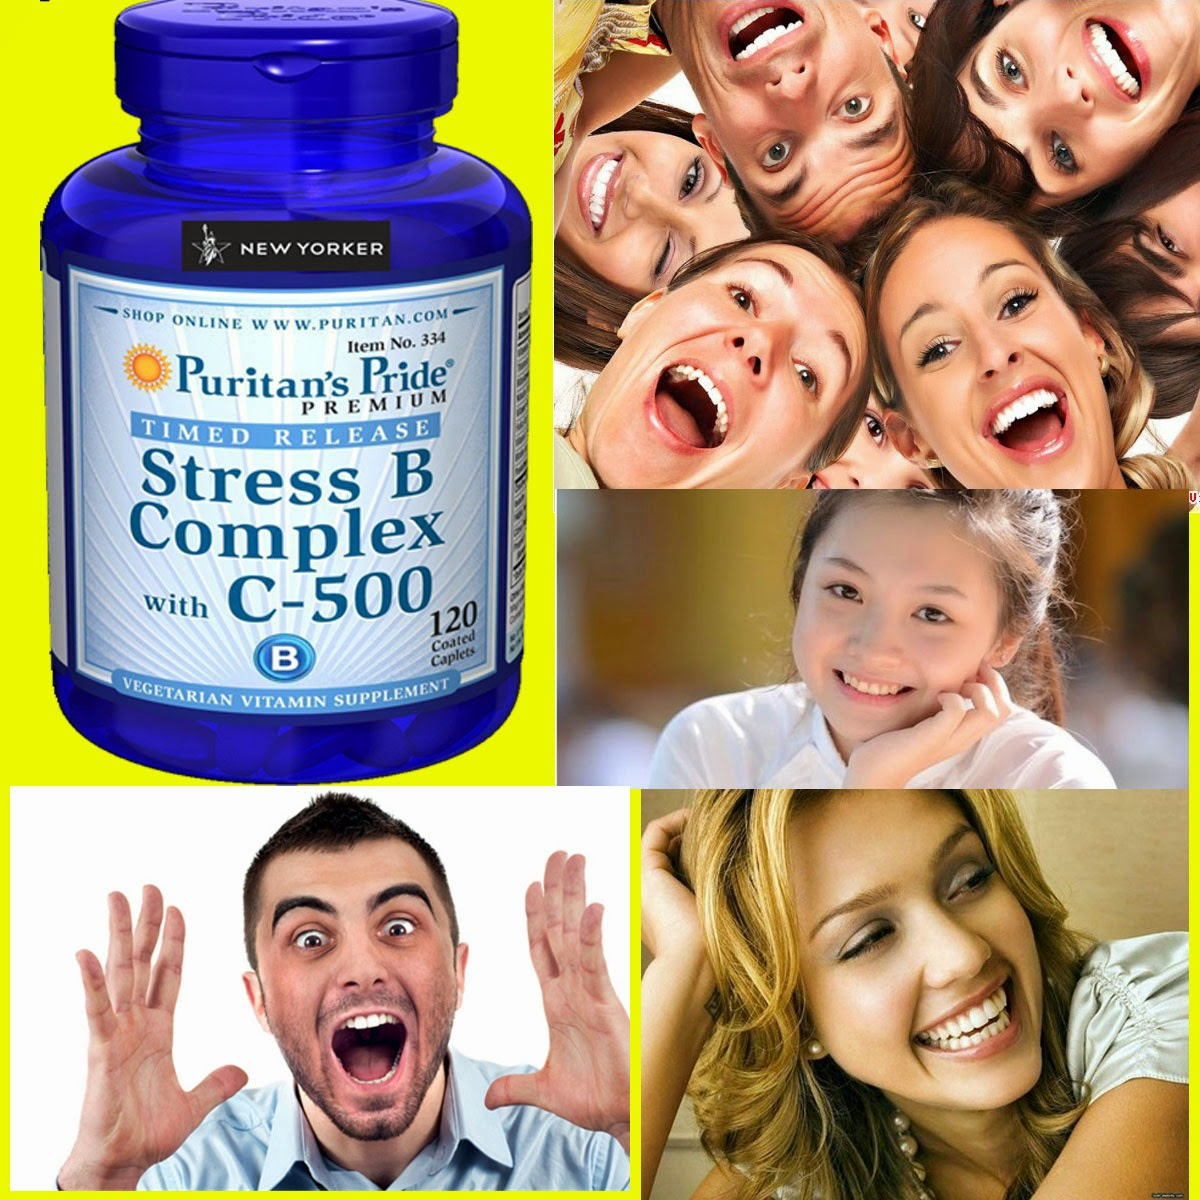 http://www.vitaminonline.info